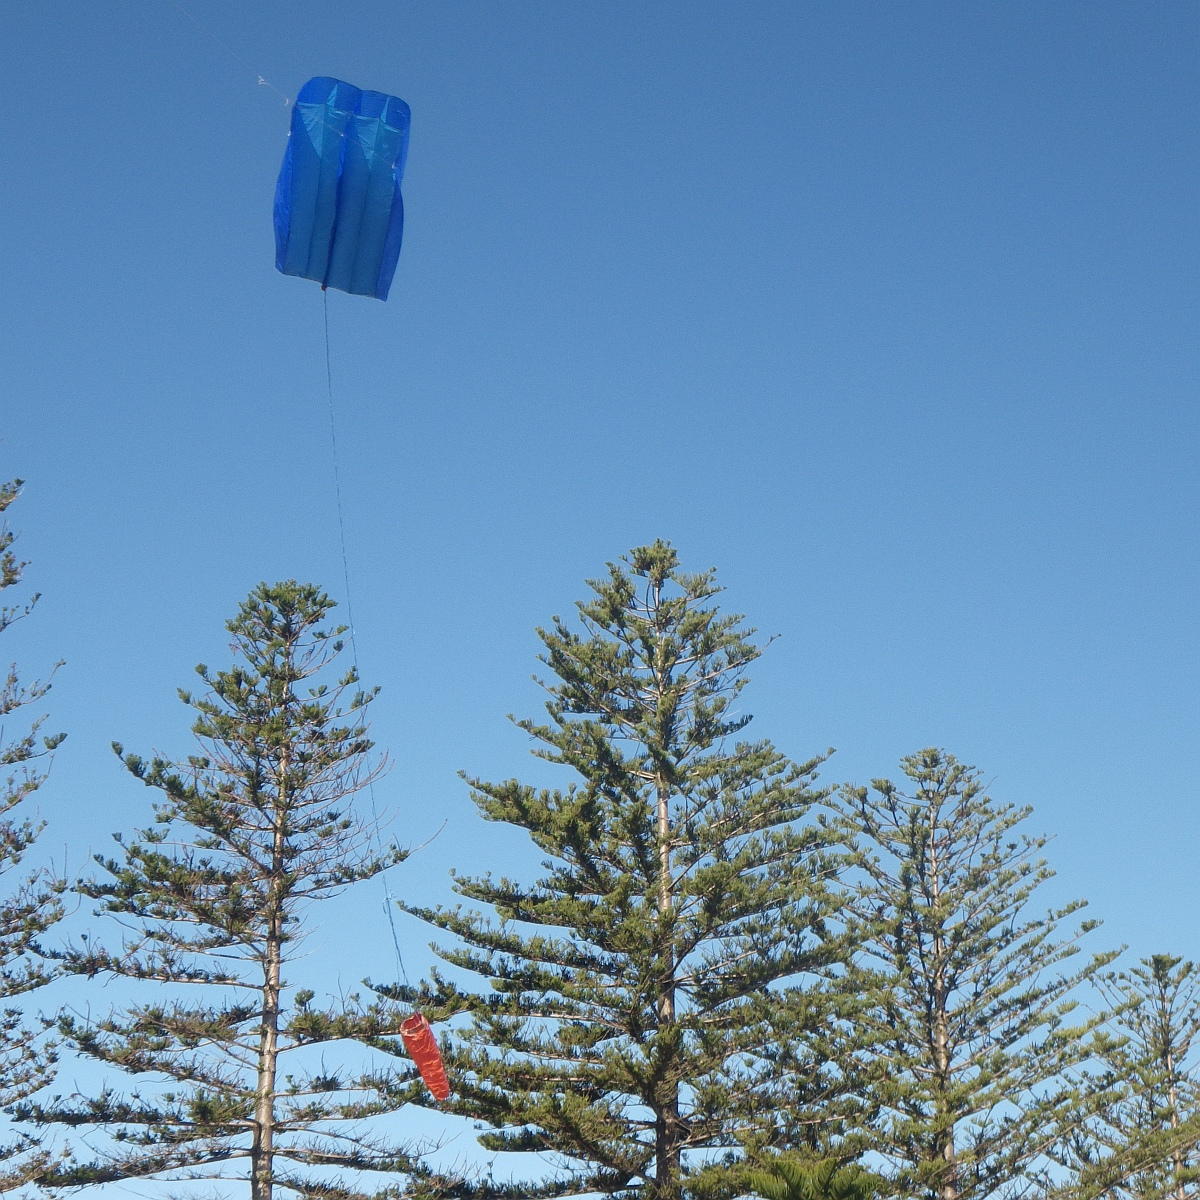 MBK Parafoil kite 1 - 3.